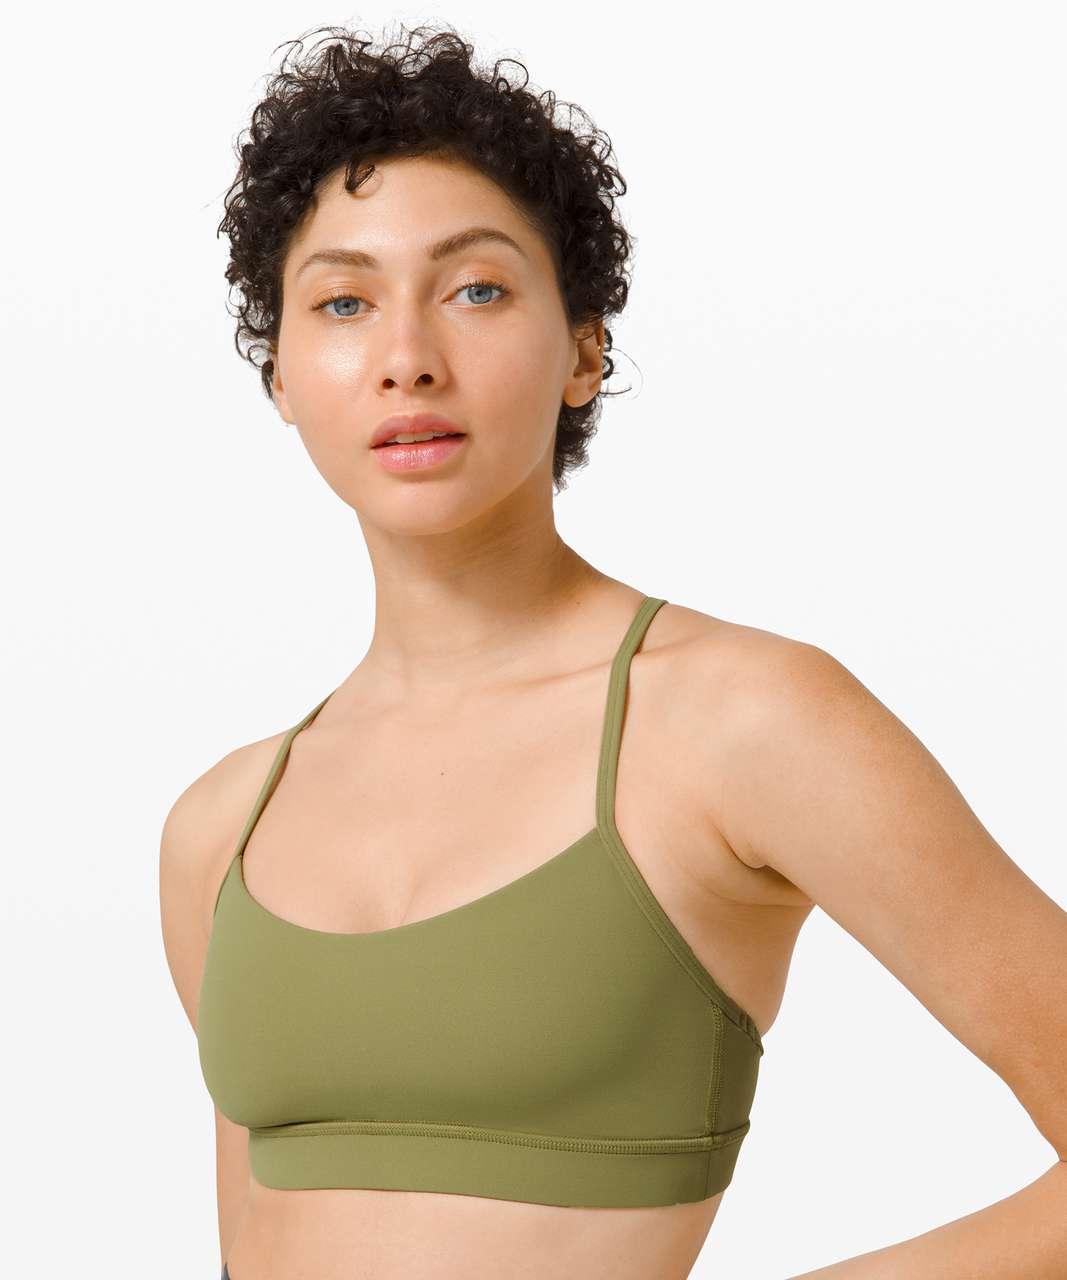 Lululemon Flow Y Bra Nulu *Light Support, B/C Cup - Bronze Green